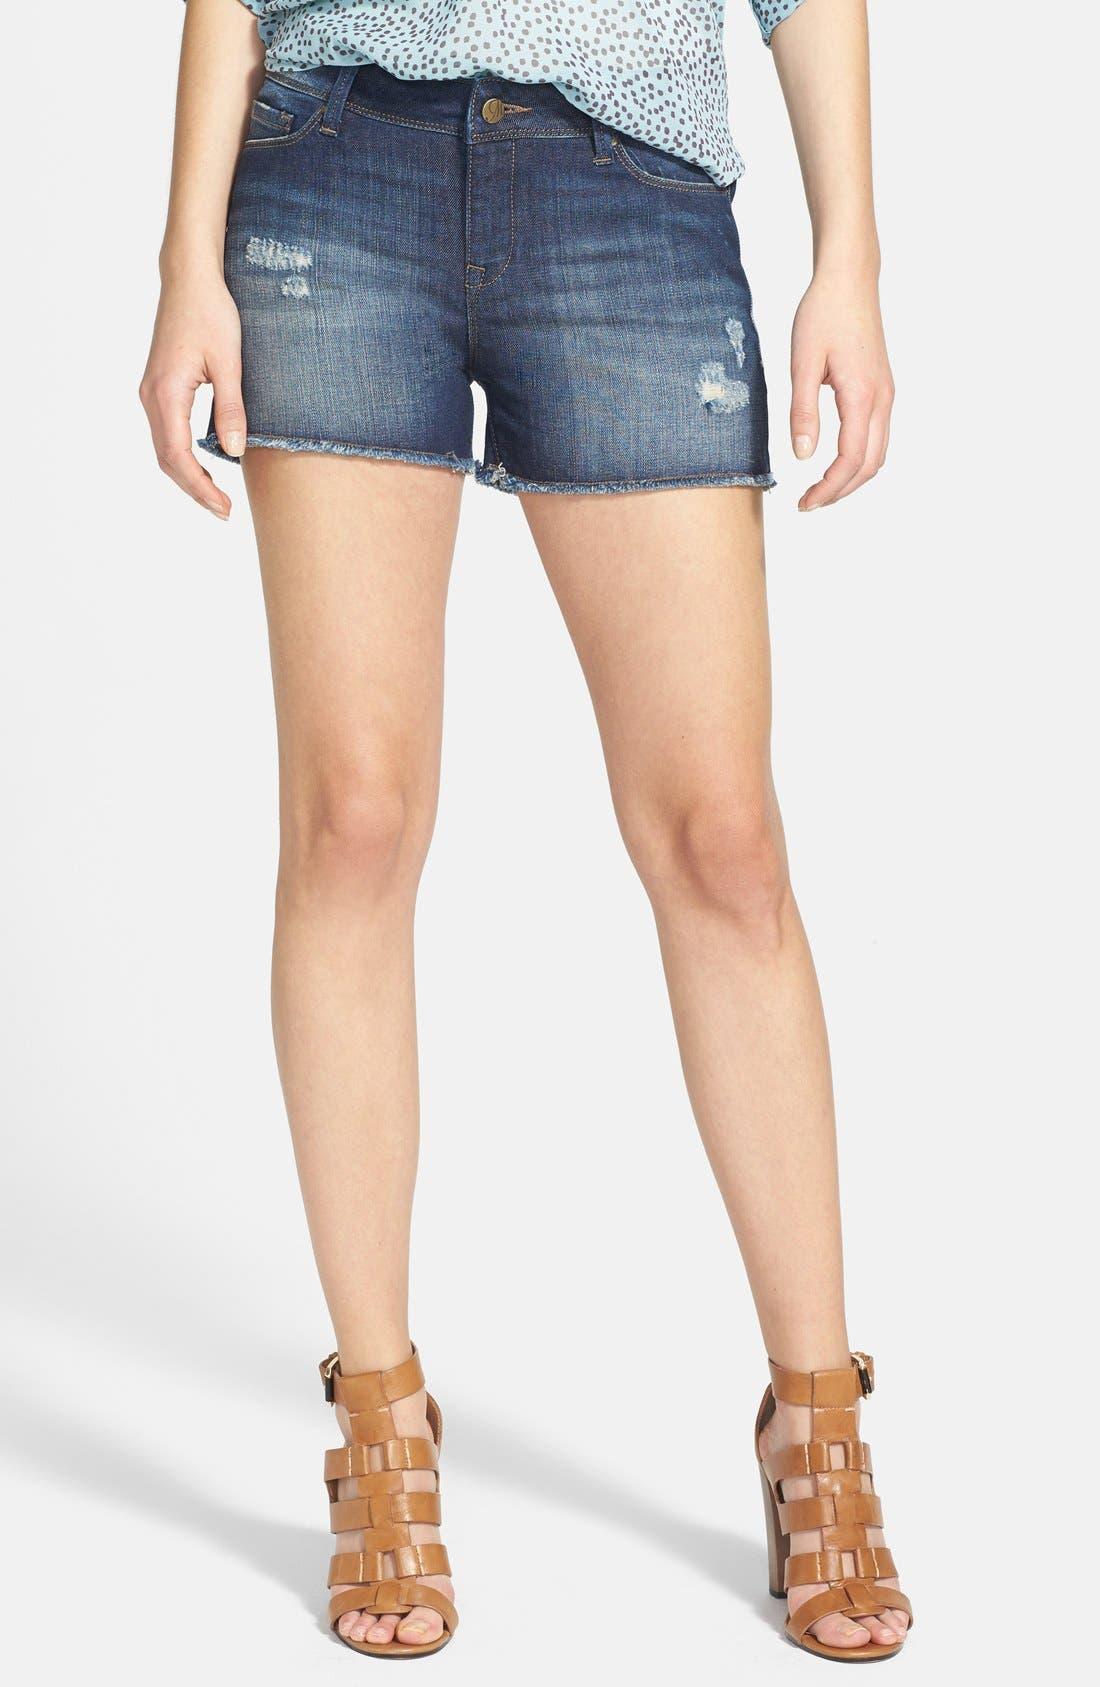 Alternate Image 1 Selected - Mavi Jeans 'Emily' Cutoff Destroyed Denim Shorts (Vintage)